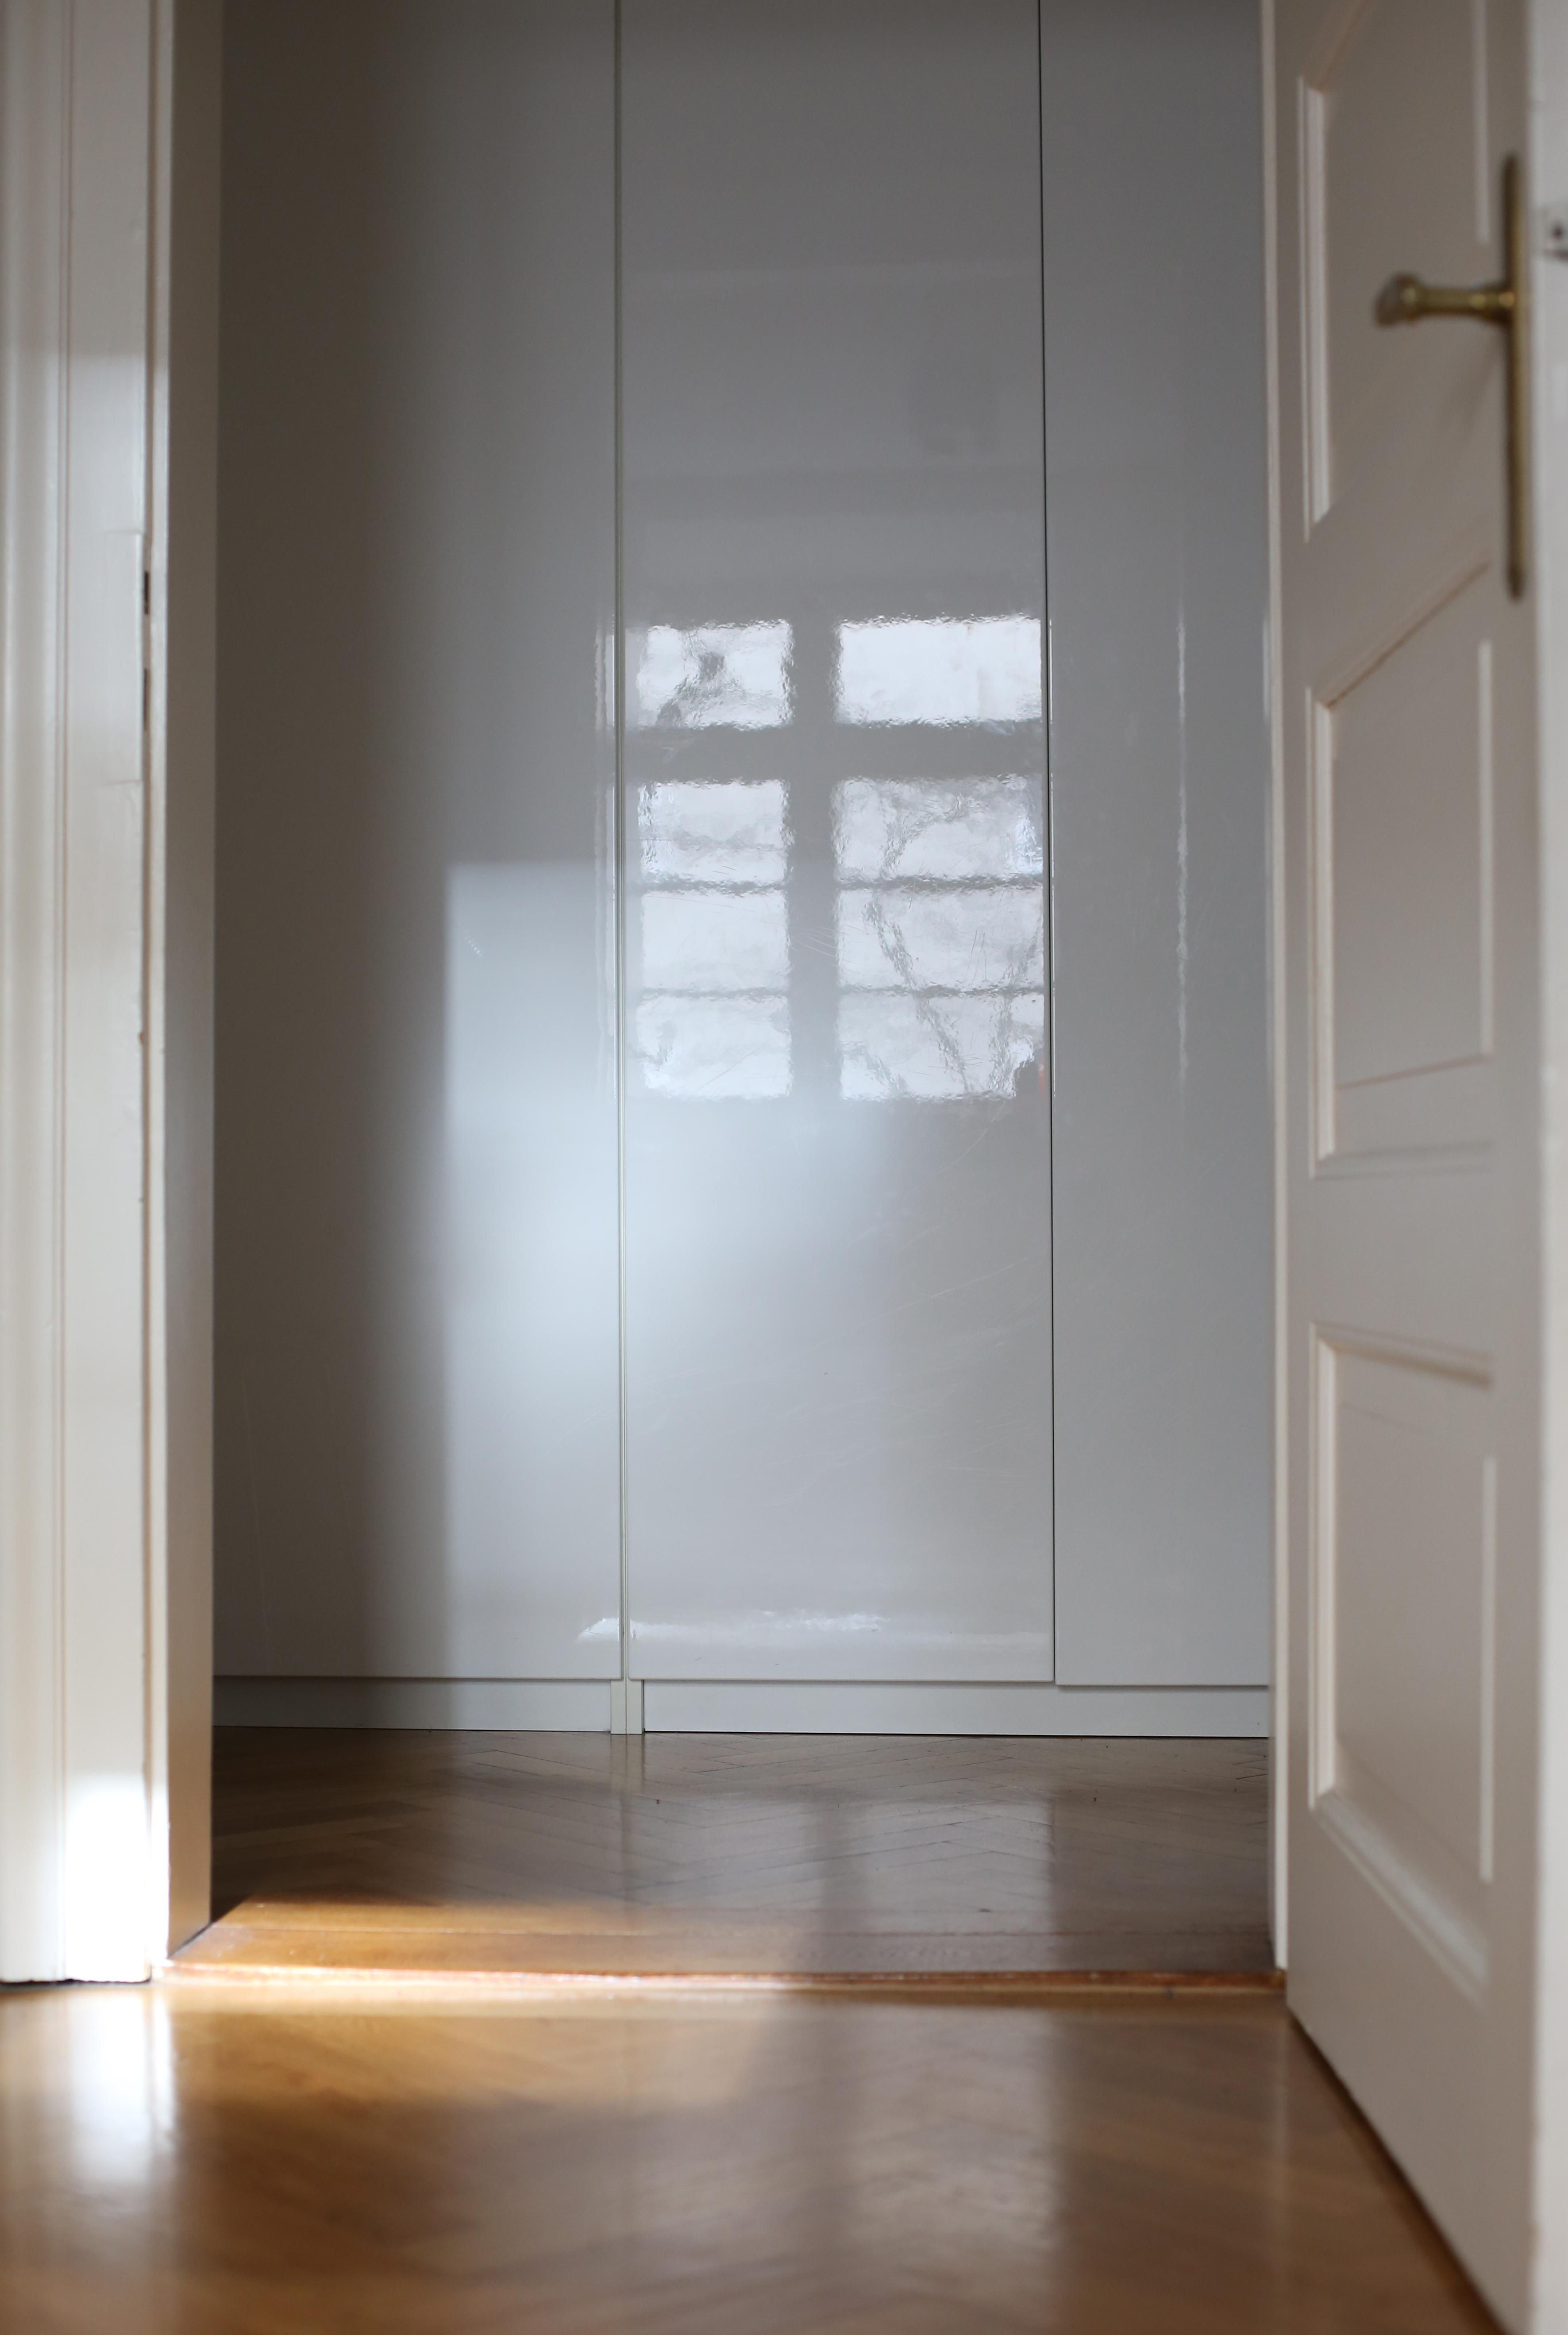 ankleide bilder ideen couch. Black Bedroom Furniture Sets. Home Design Ideas